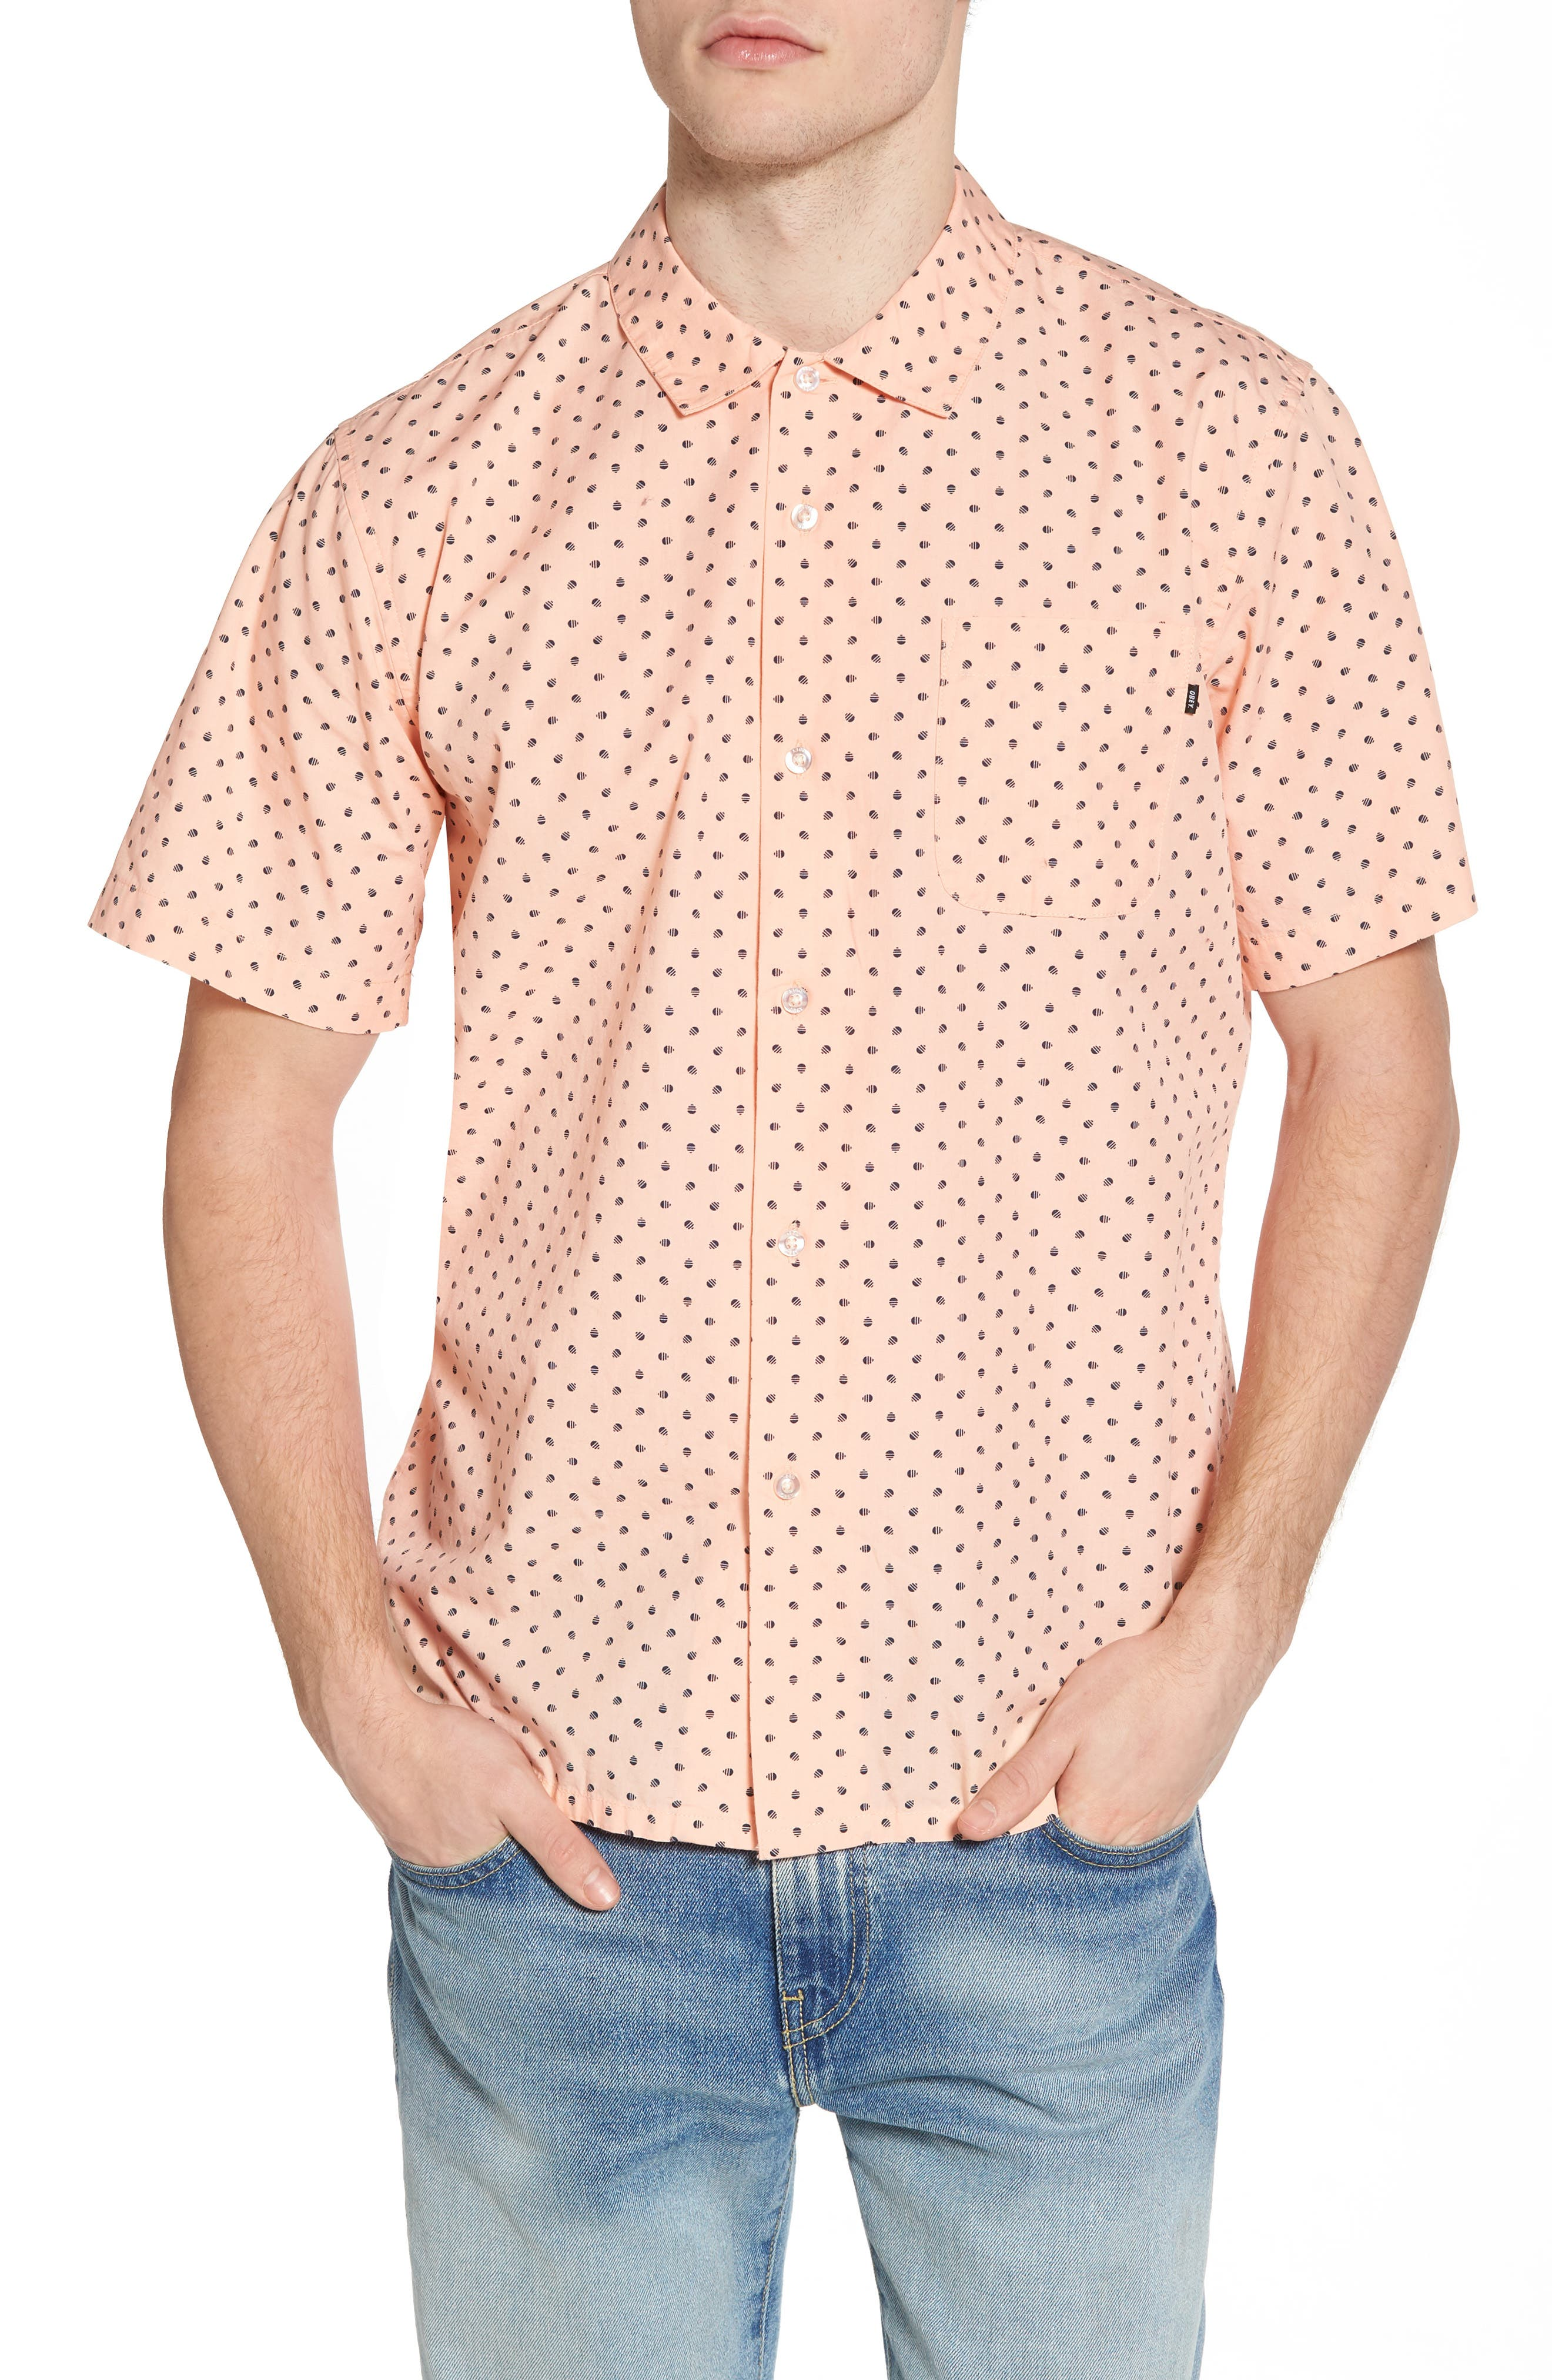 Main Image - Obey Gavin Short Sleeve Shirts